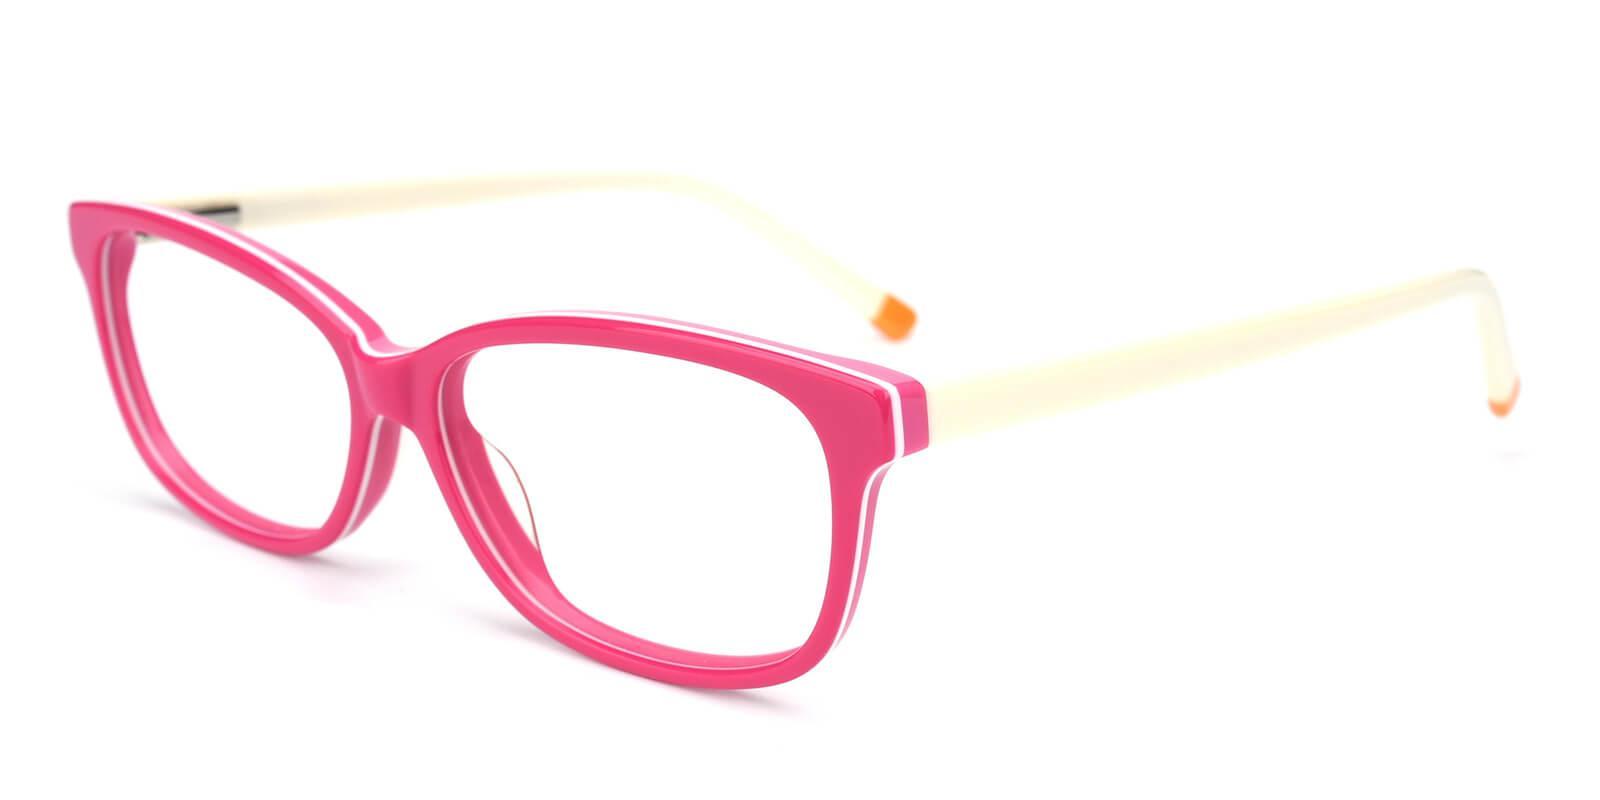 Zion-Pink-Cat-Acetate-Eyeglasses-detail